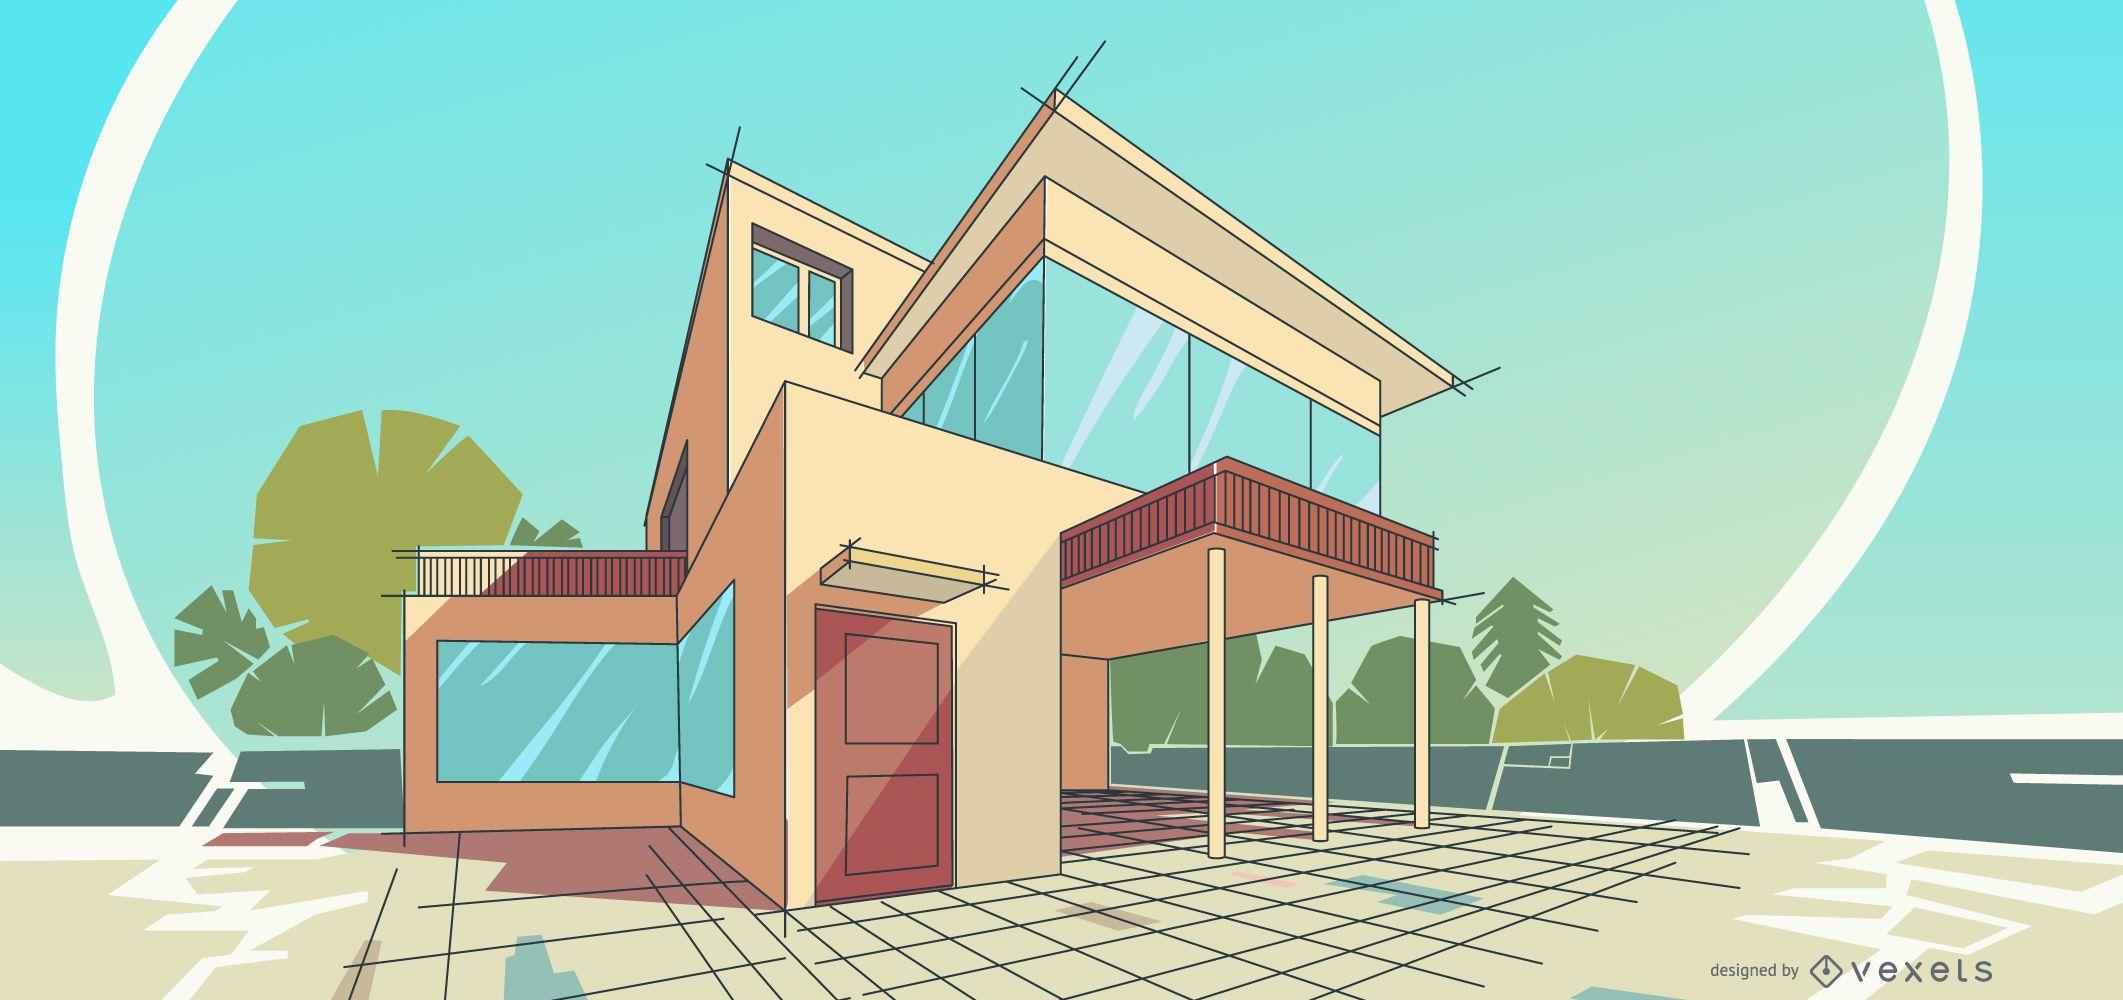 Architecture House Illustration Design